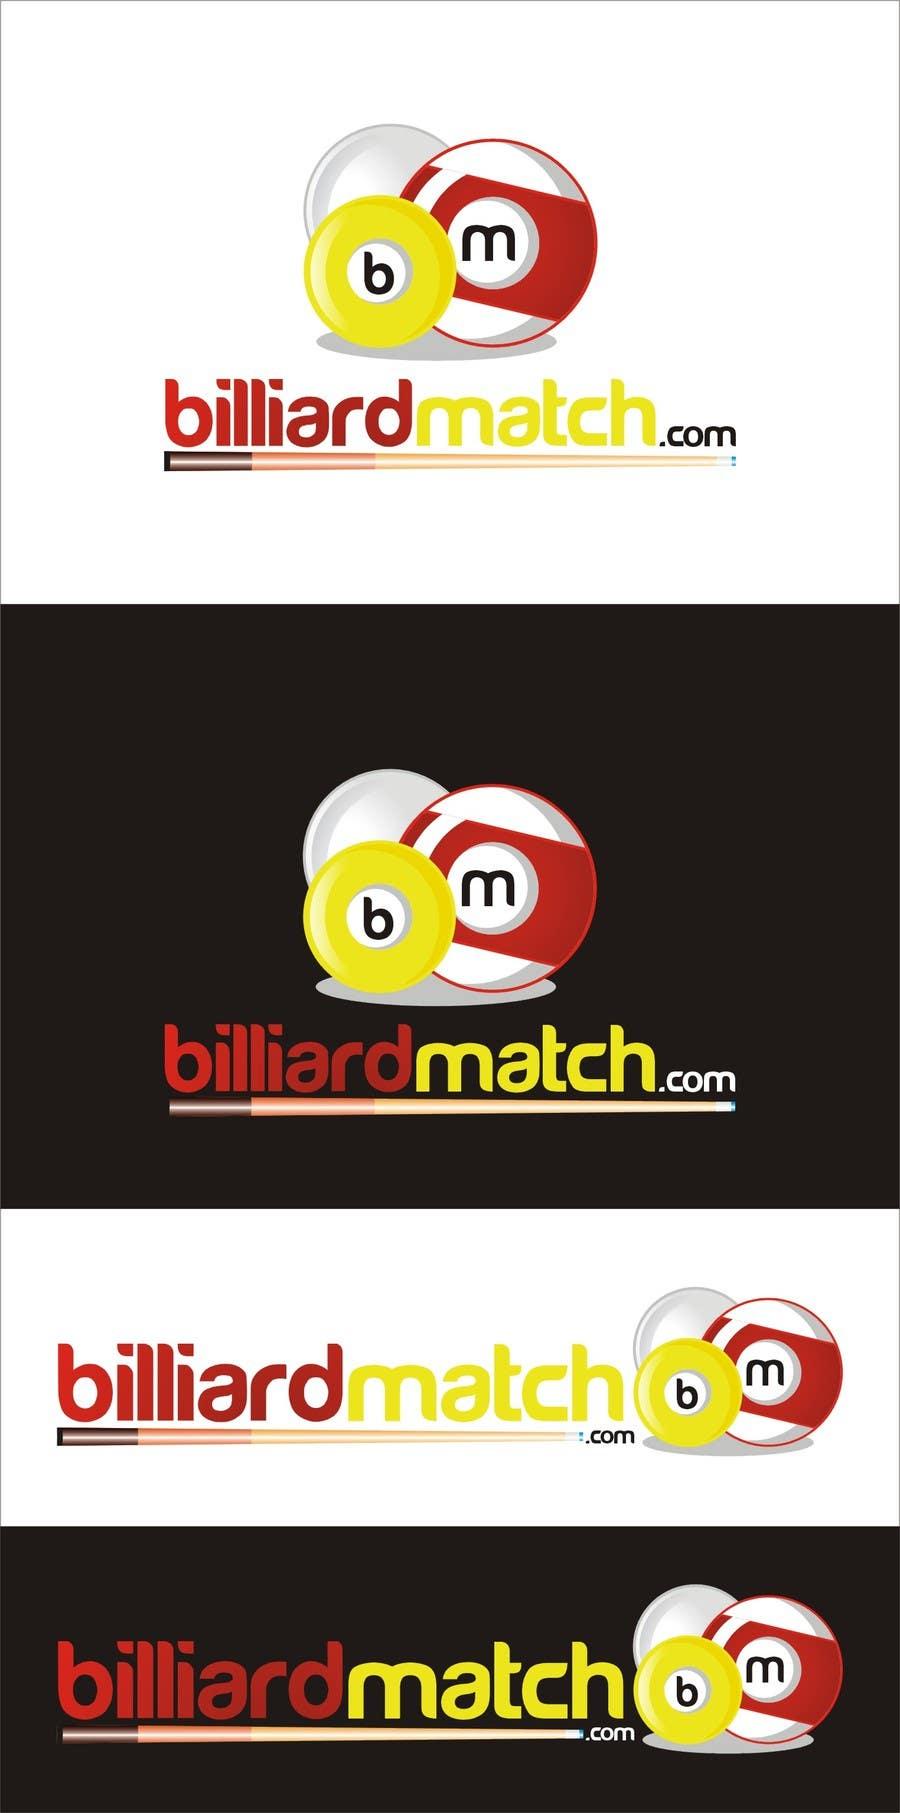 Kilpailutyö #11 kilpailussa Design a Logo for a billiard tournament & score-keeping website.